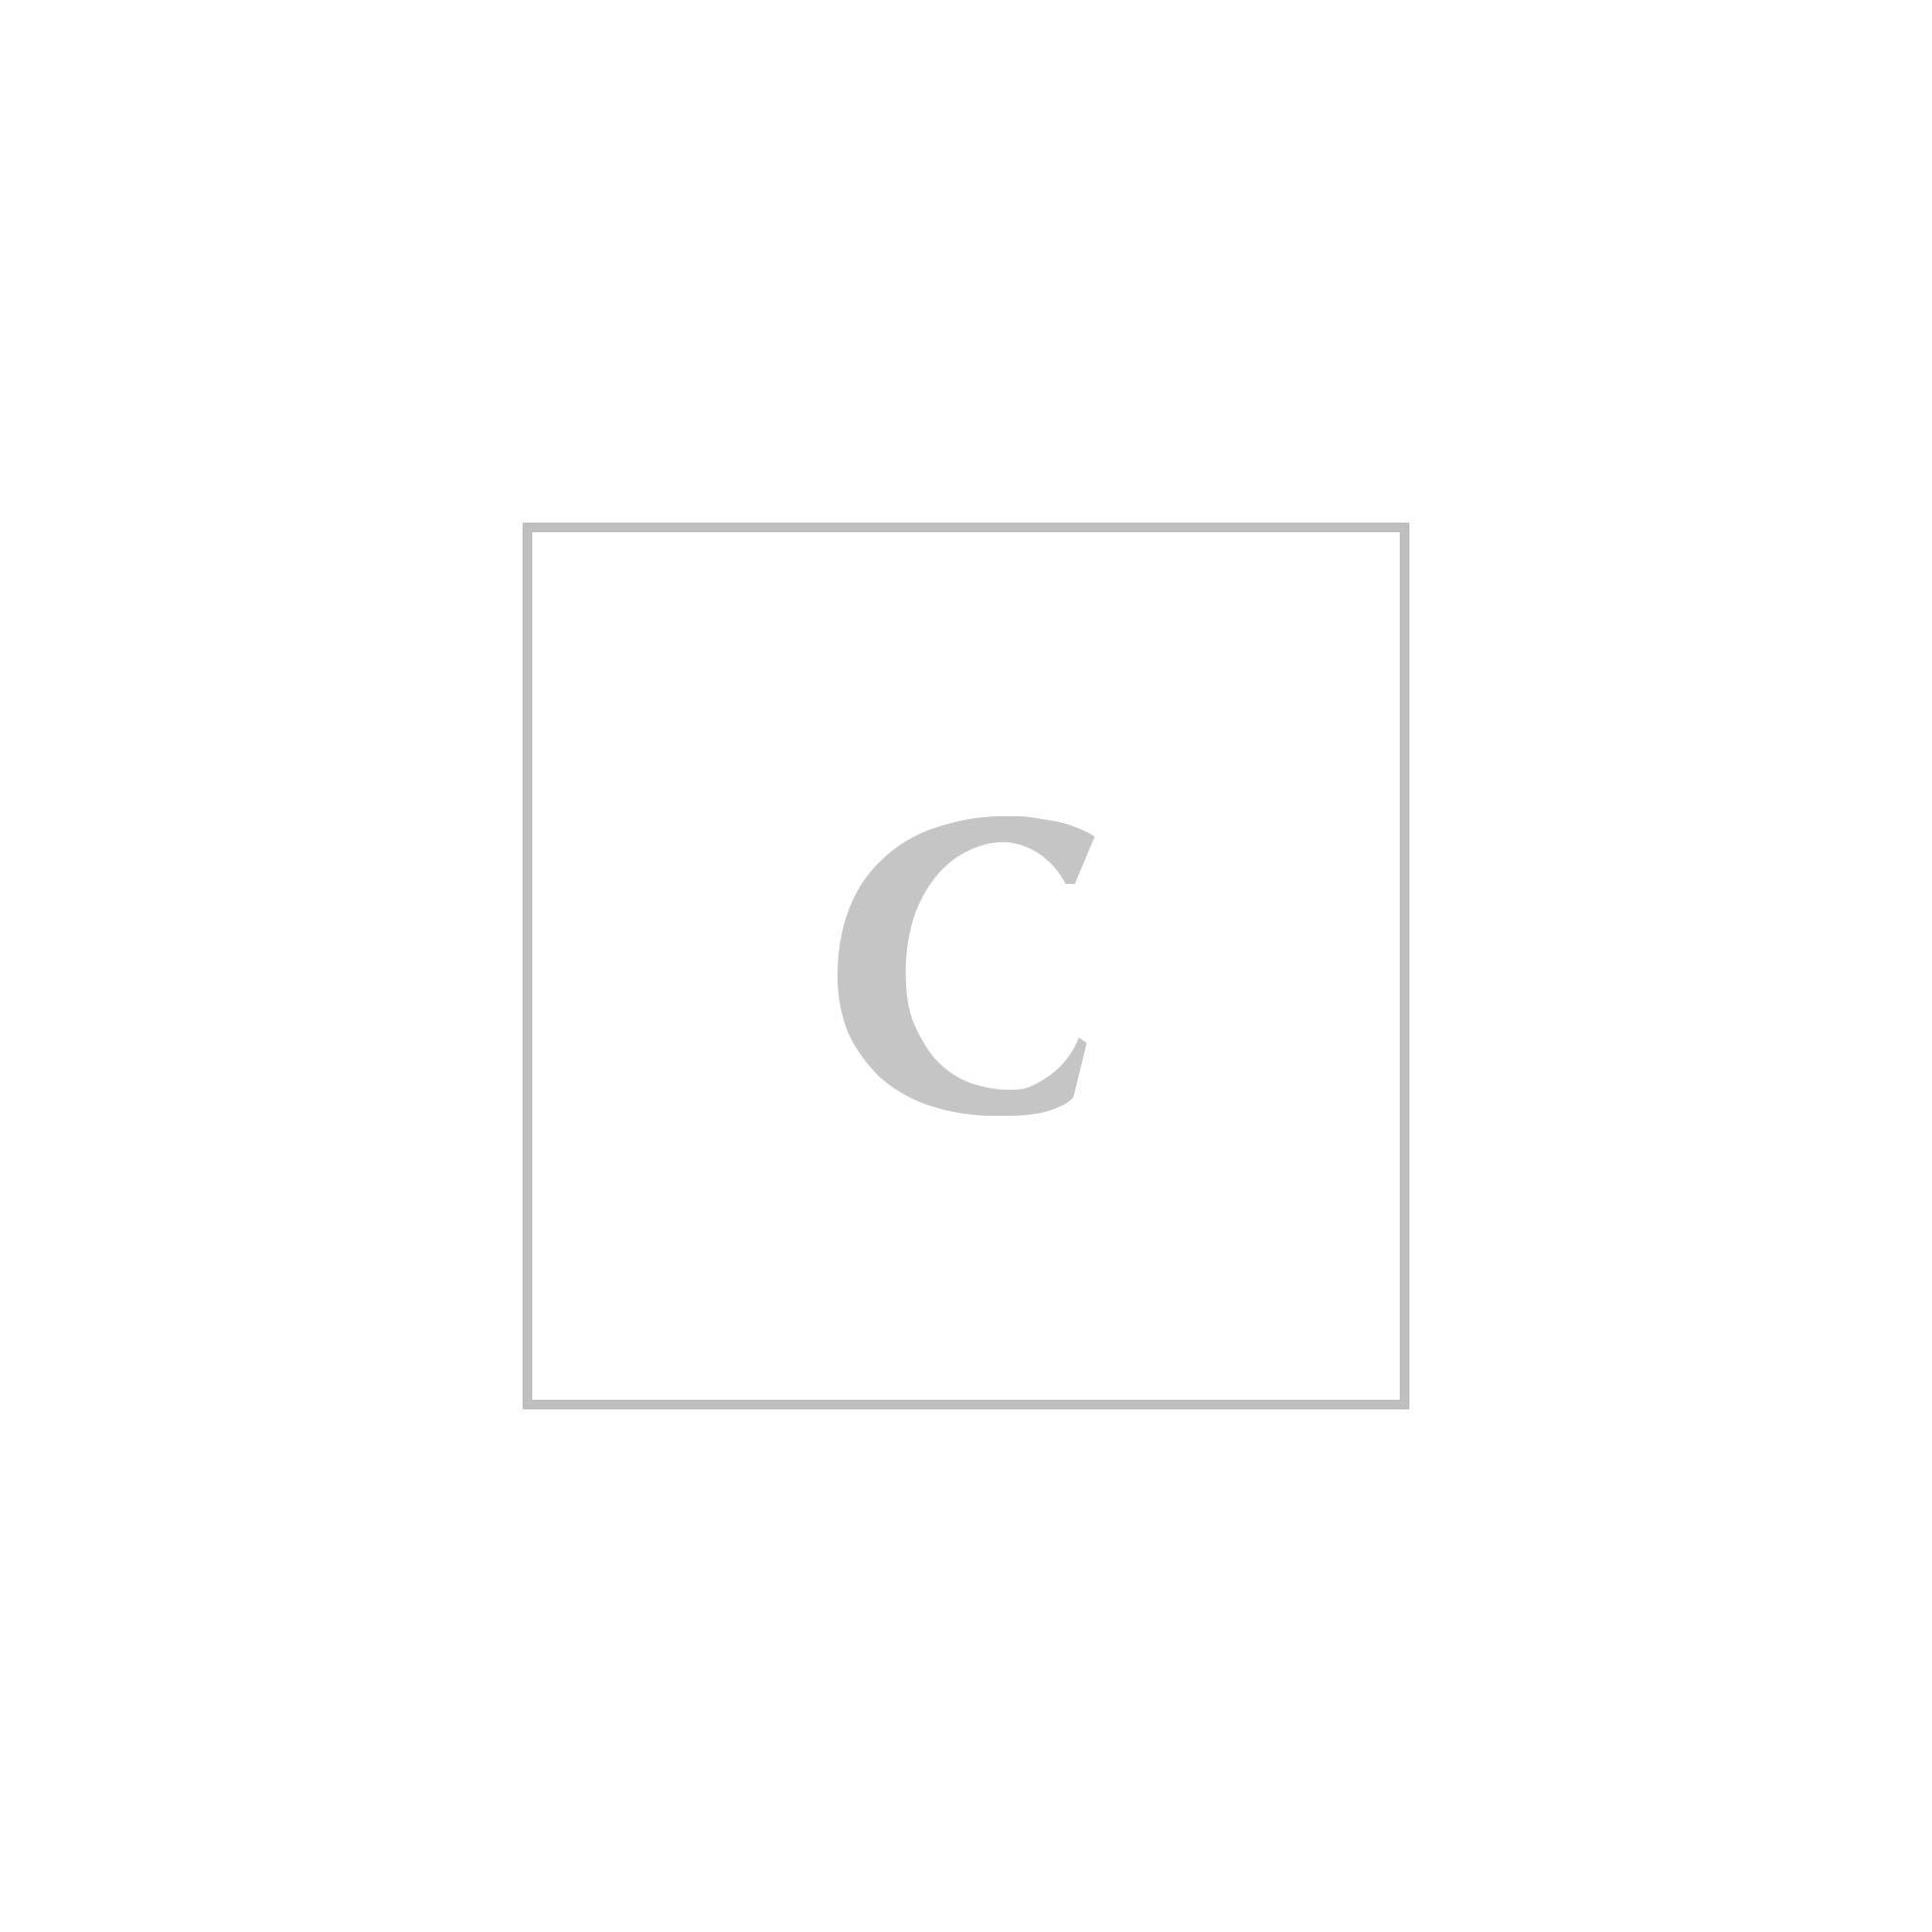 Prada maglieria lana pettinata f.30